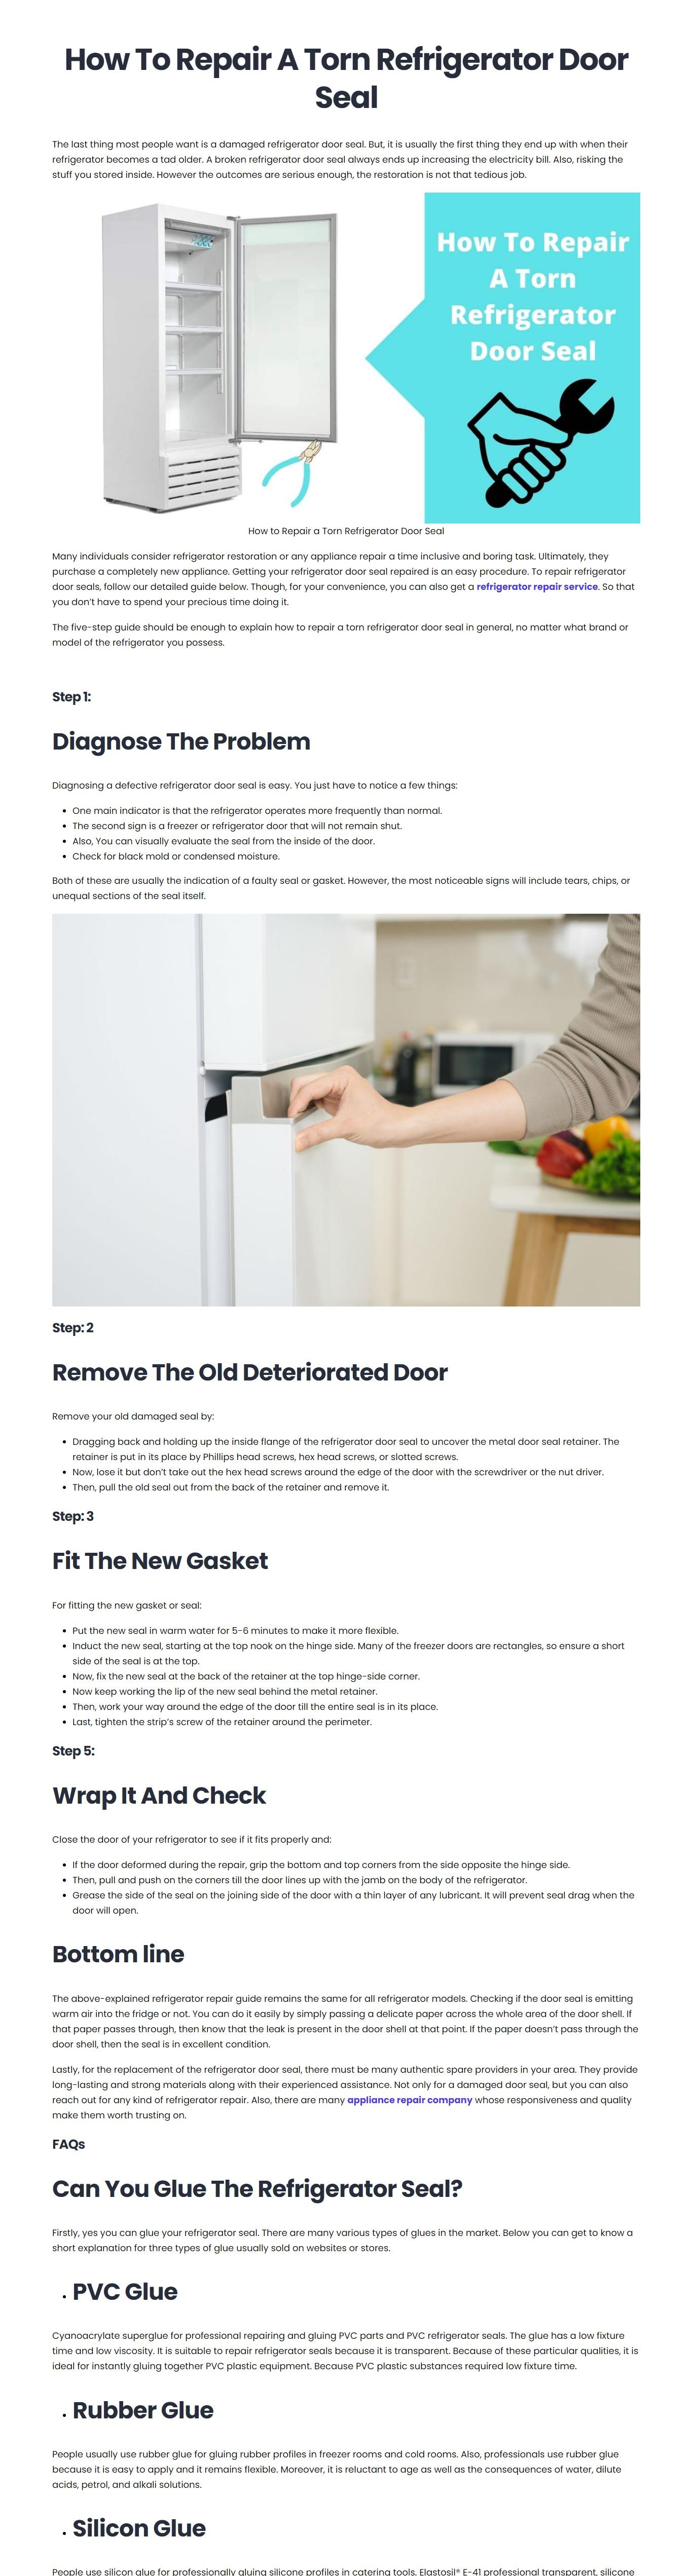 How to repair a torn refrigerator door seal - Quora